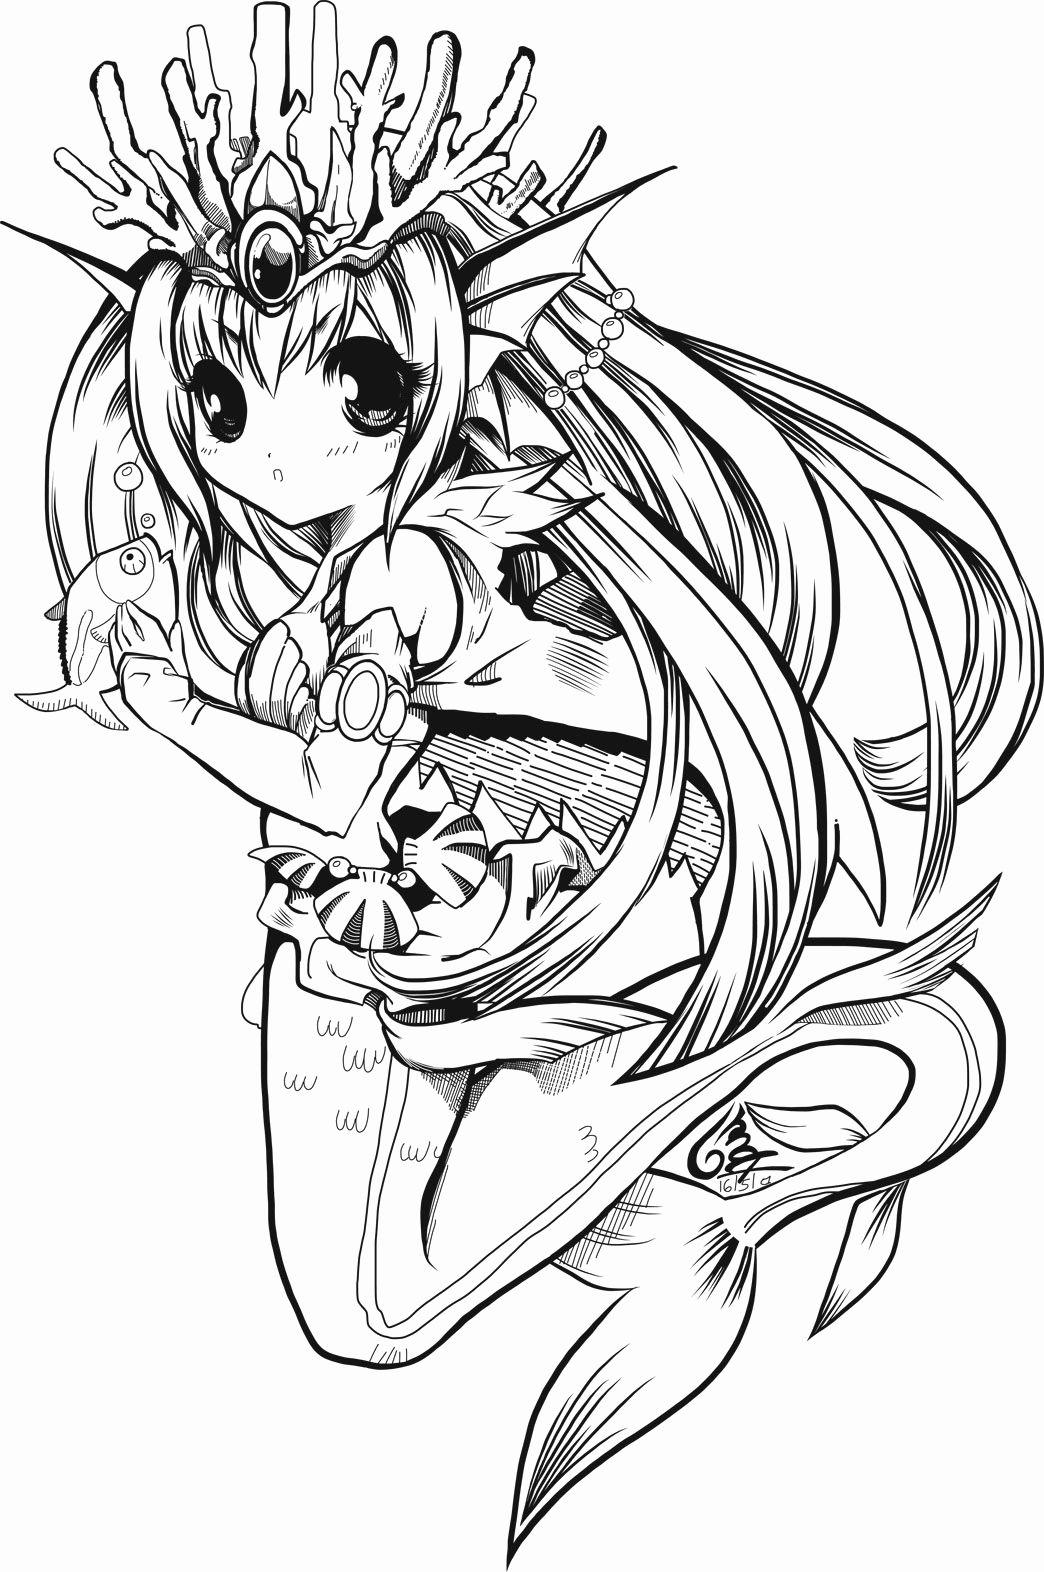 Anime Mermaid Coloring Pages For Kids Mermaid Coloring Pages Mermaid Coloring Book Mermaid Coloring